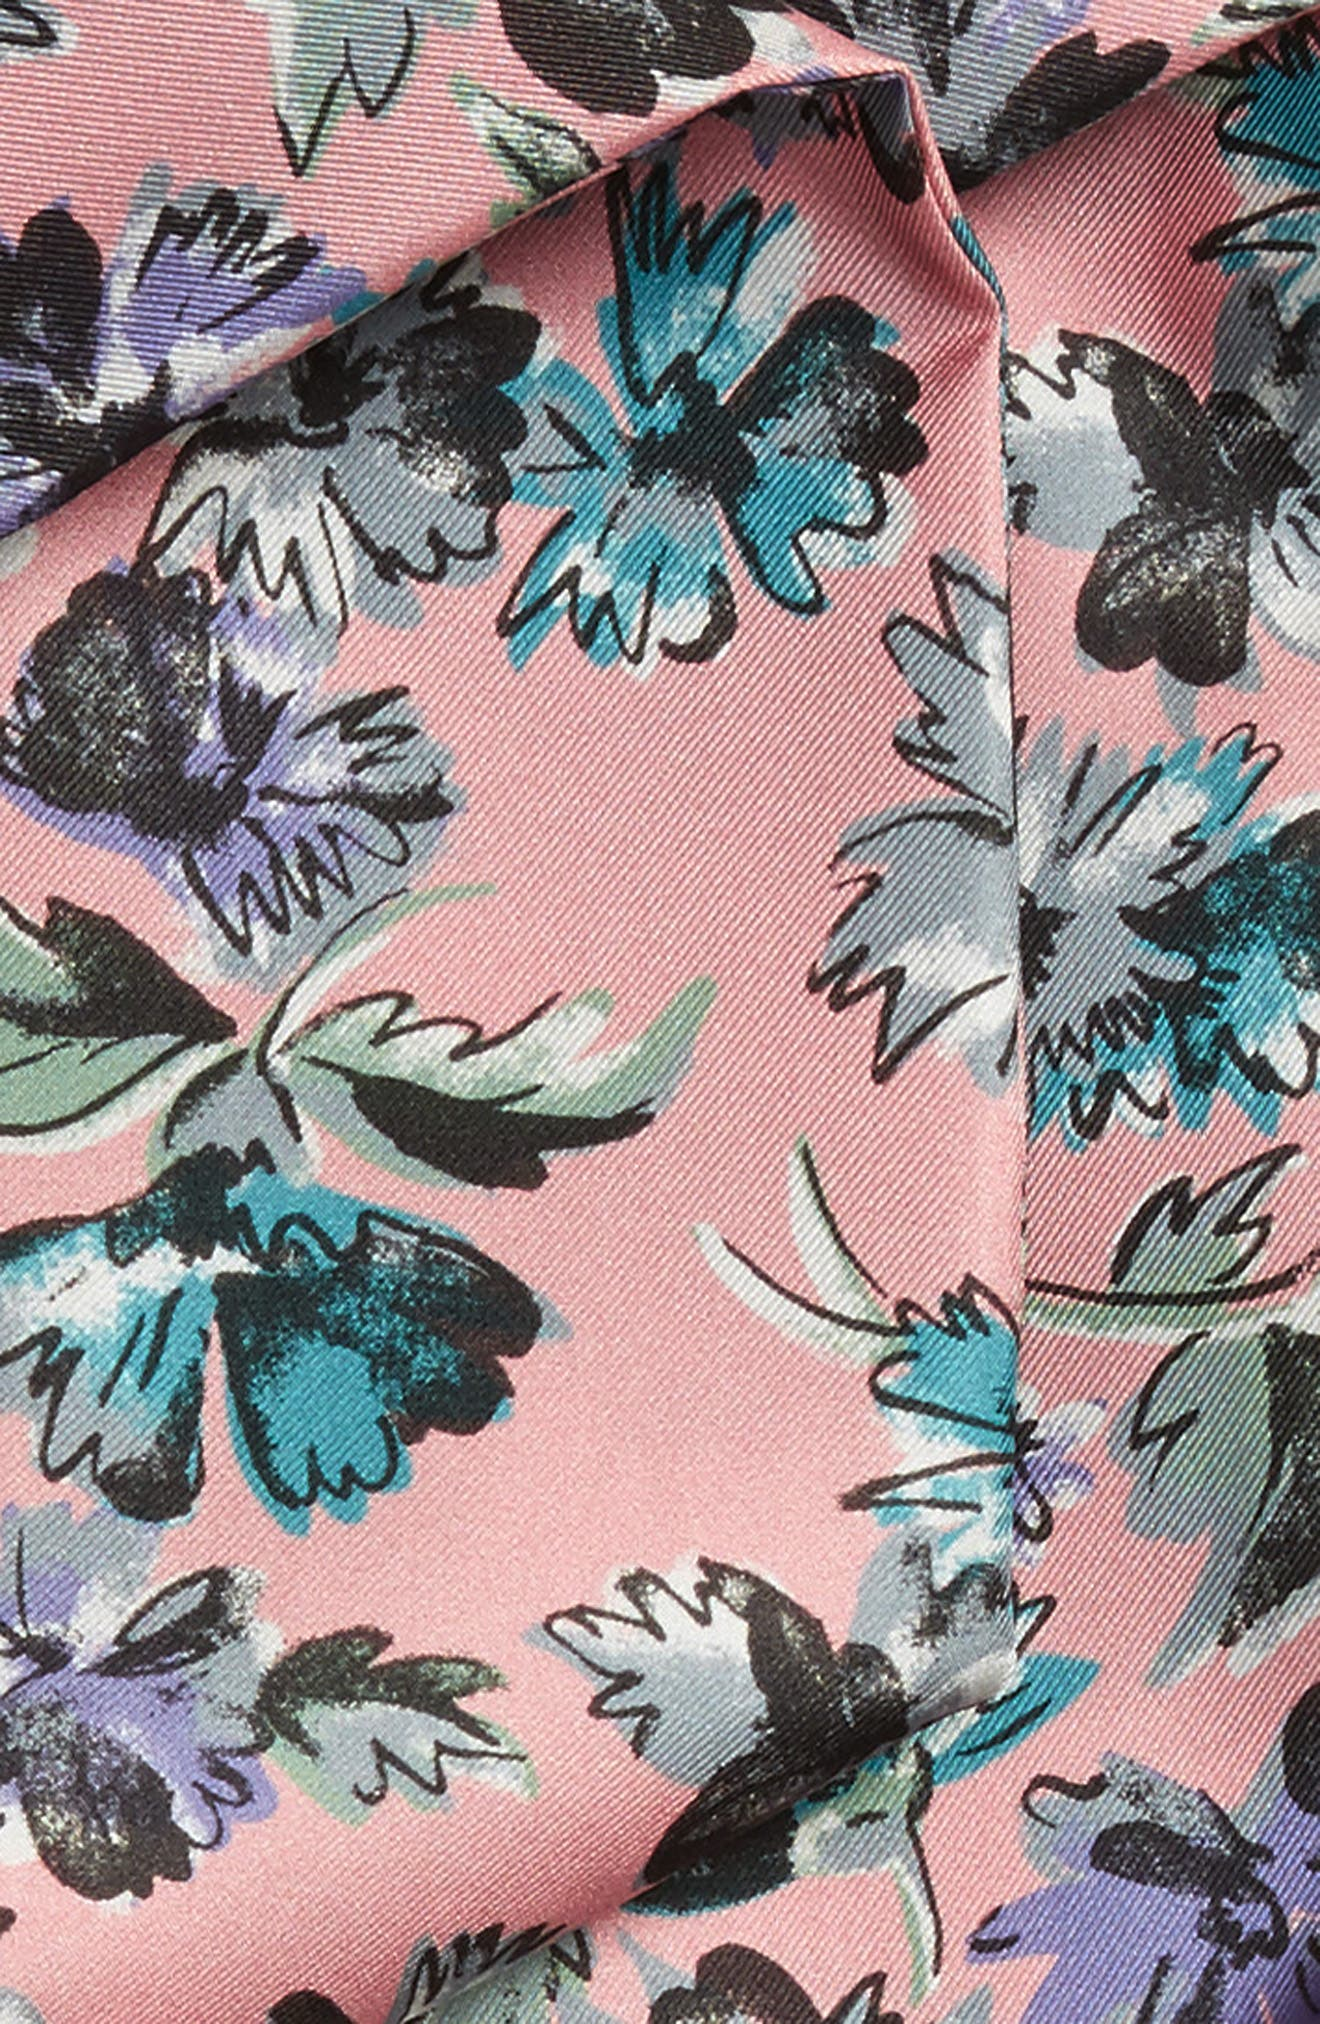 Scatter Floral Silk Skinny Scarf,                             Alternate thumbnail 3, color,                             Rose Pink